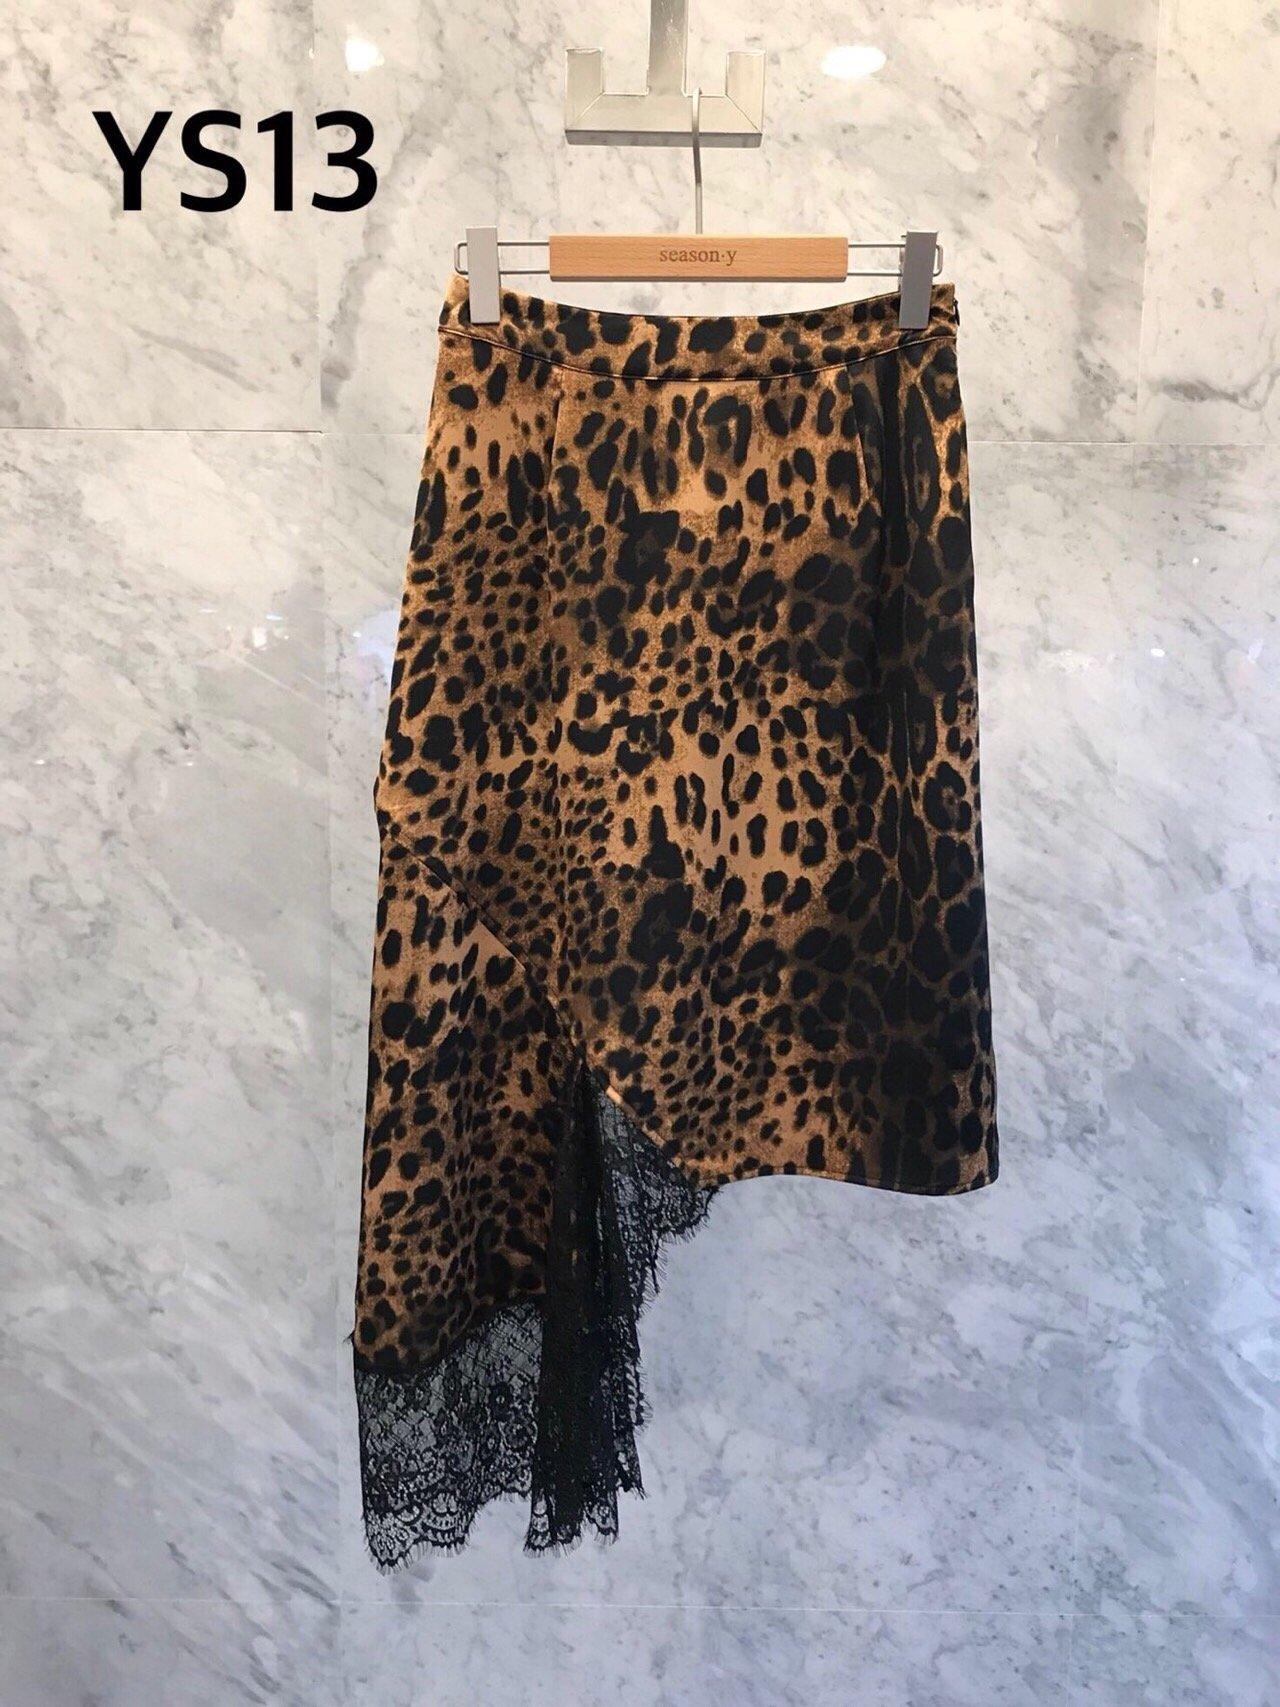 JS NEW YORK 系列 韩国女装 秋 不规则蕾丝边时尚豹纹半身裙917